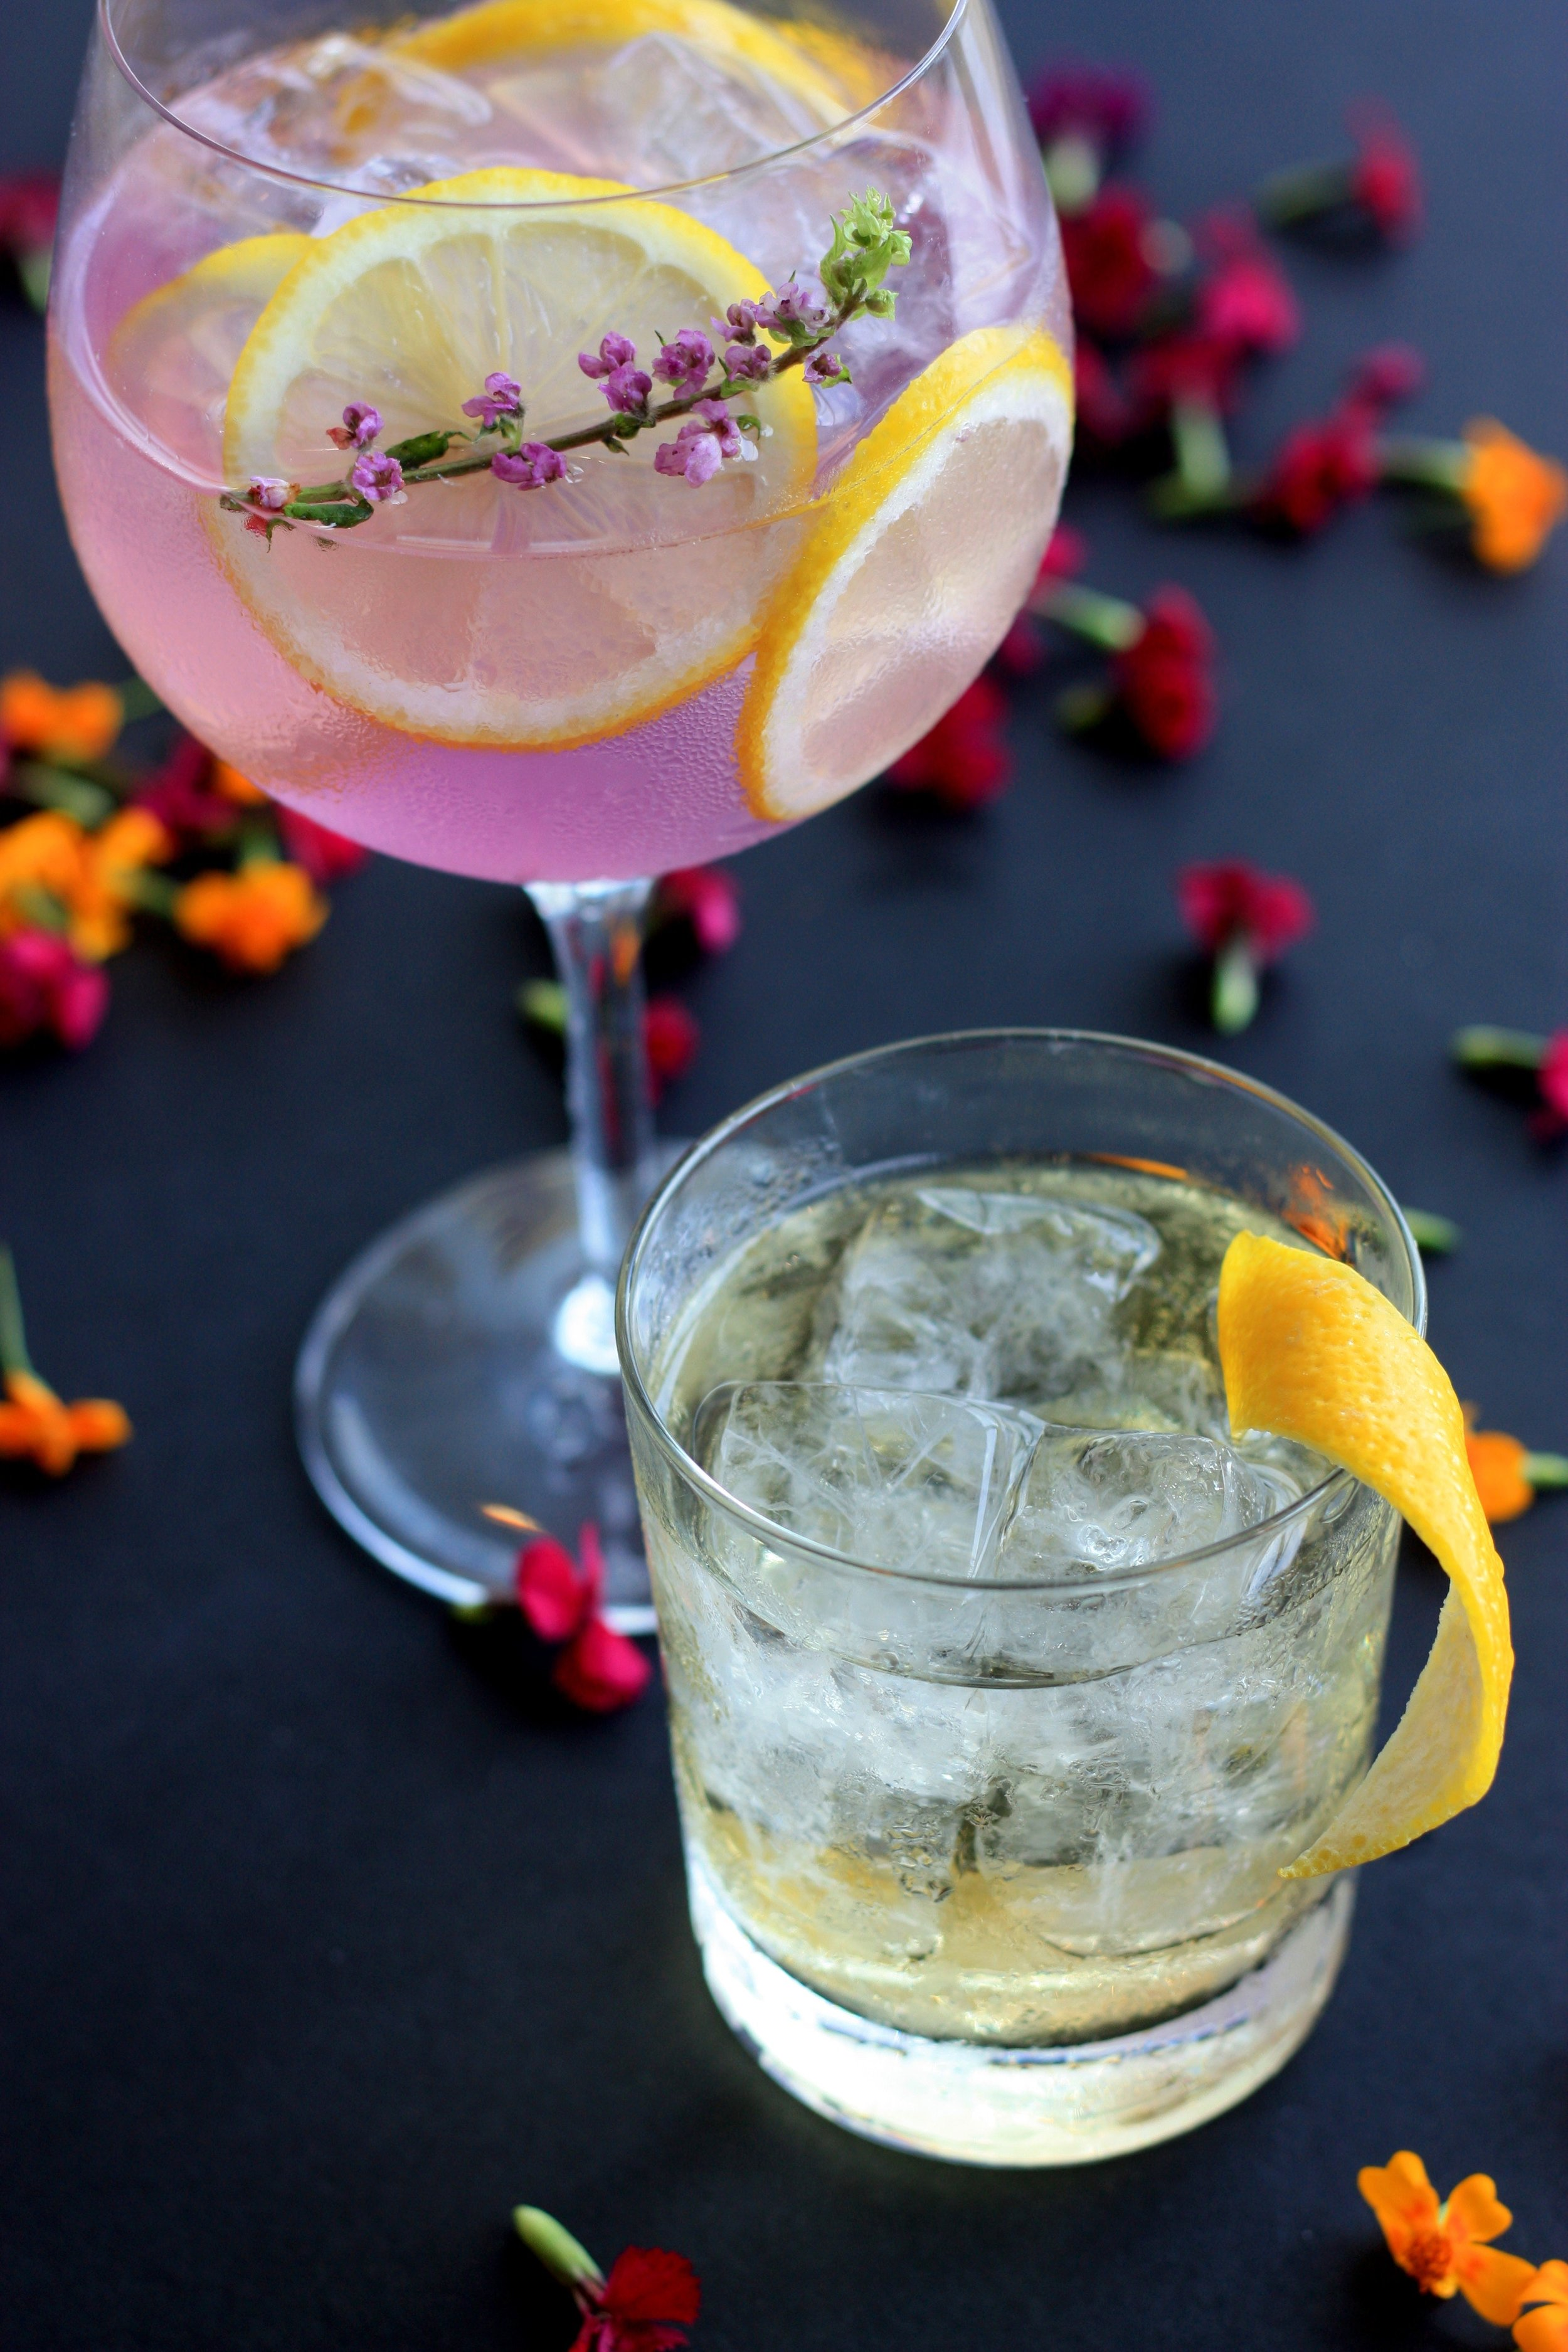 alcohol-alcoholic-beverage-beverage-1723638.jpg